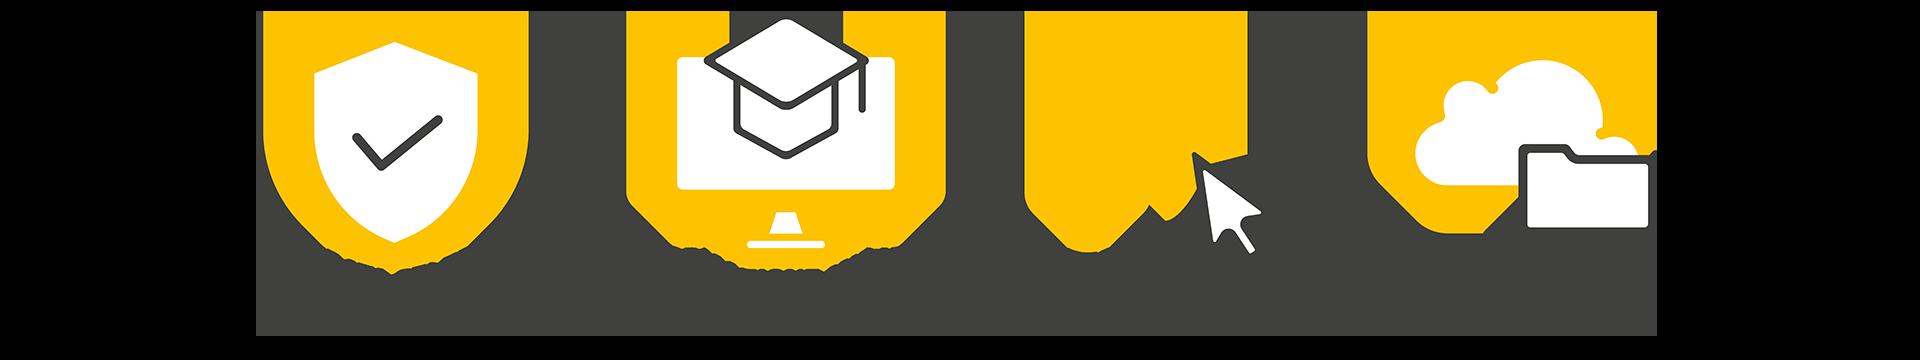 Infografica Lezioni Online